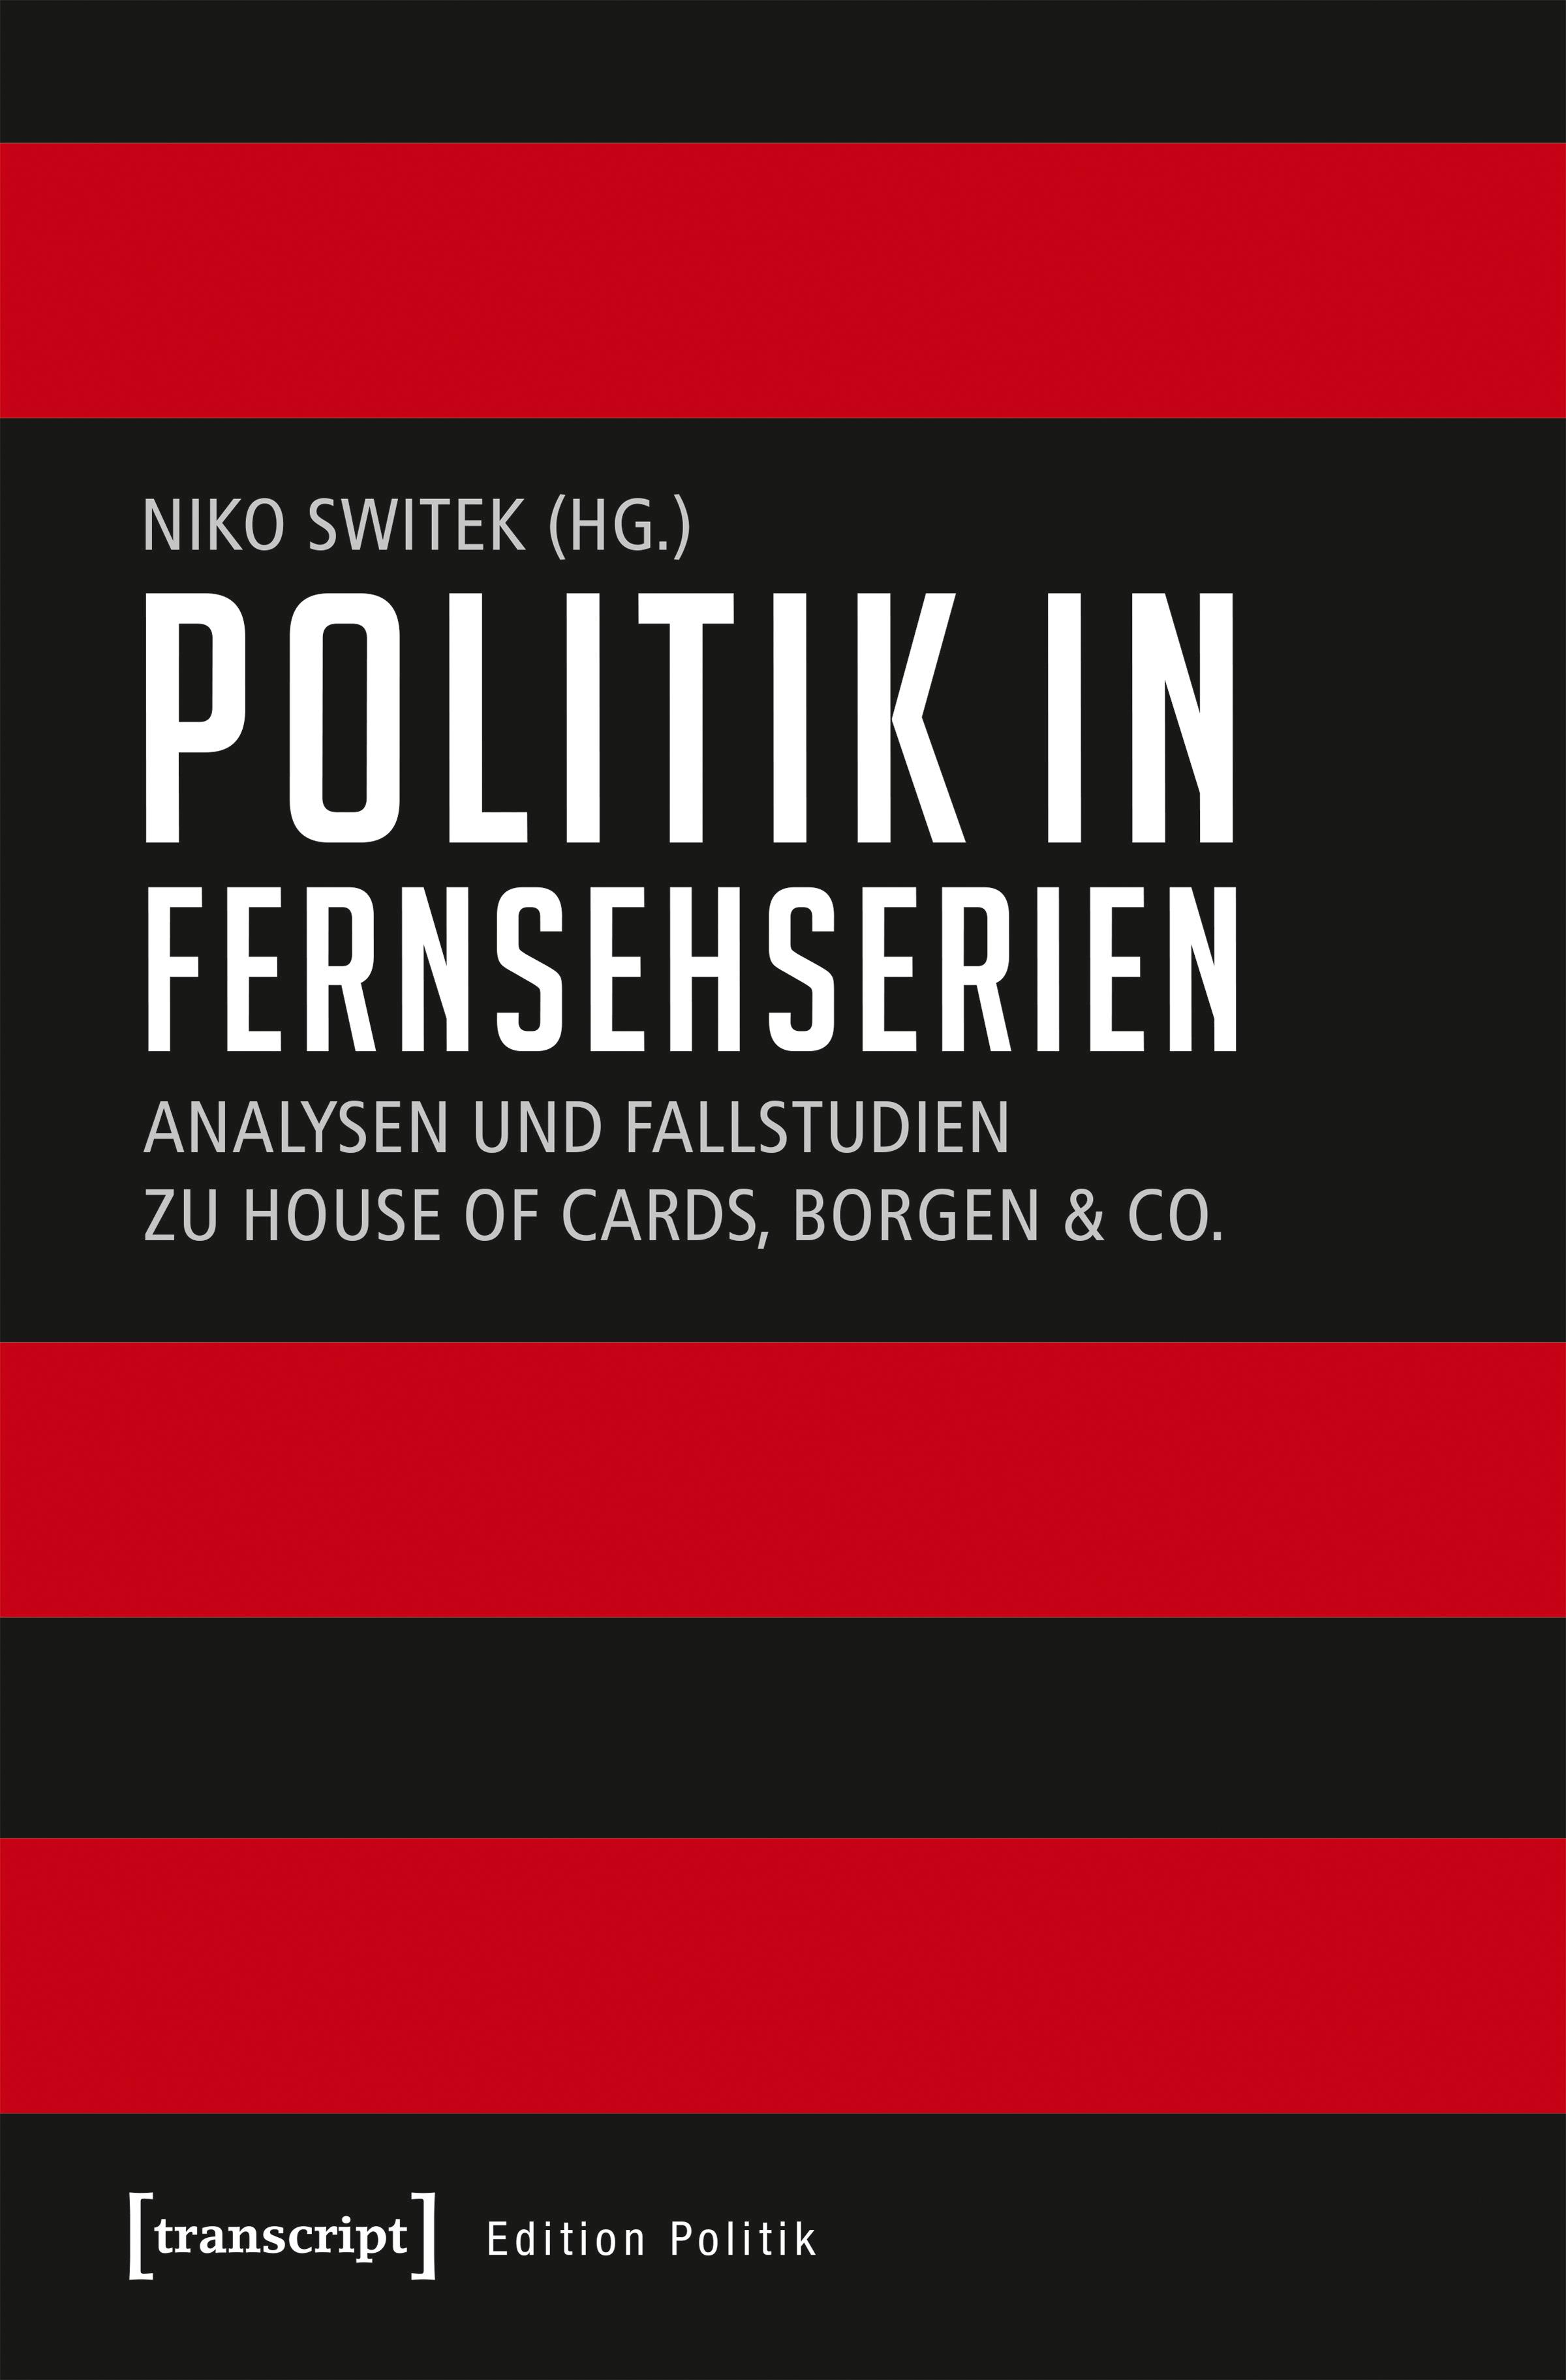 Politik in Fernsehserien